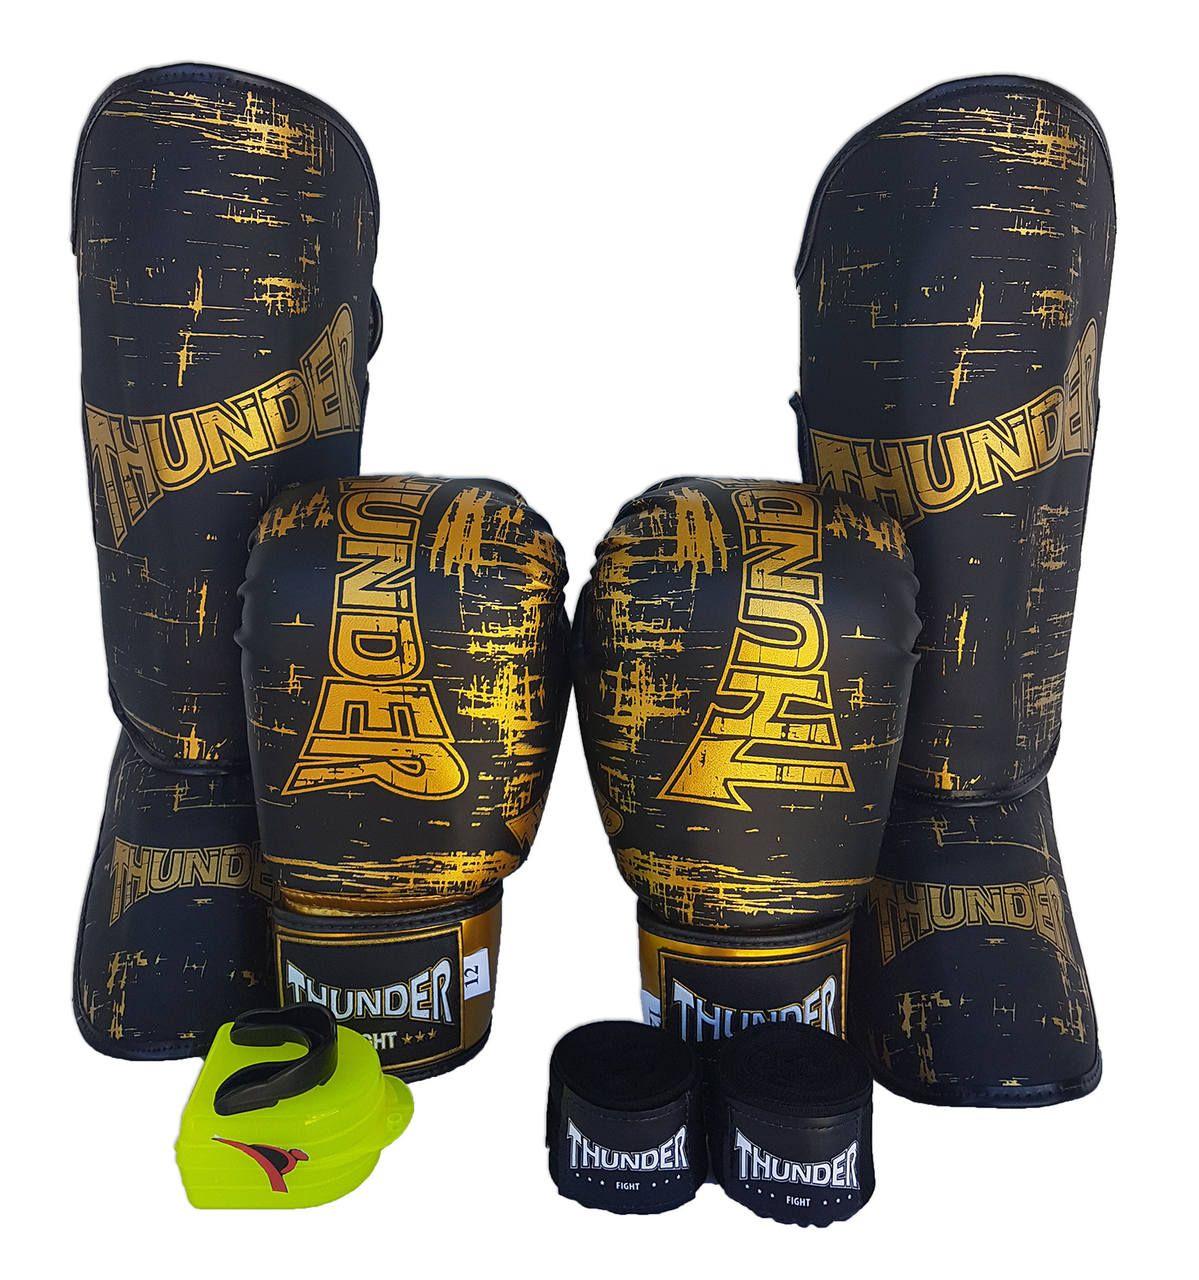 Super Kit de Muay Thai / Kickboxing 12oz - Caneleira M - Preto - Thunder Fight  - PRALUTA SHOP